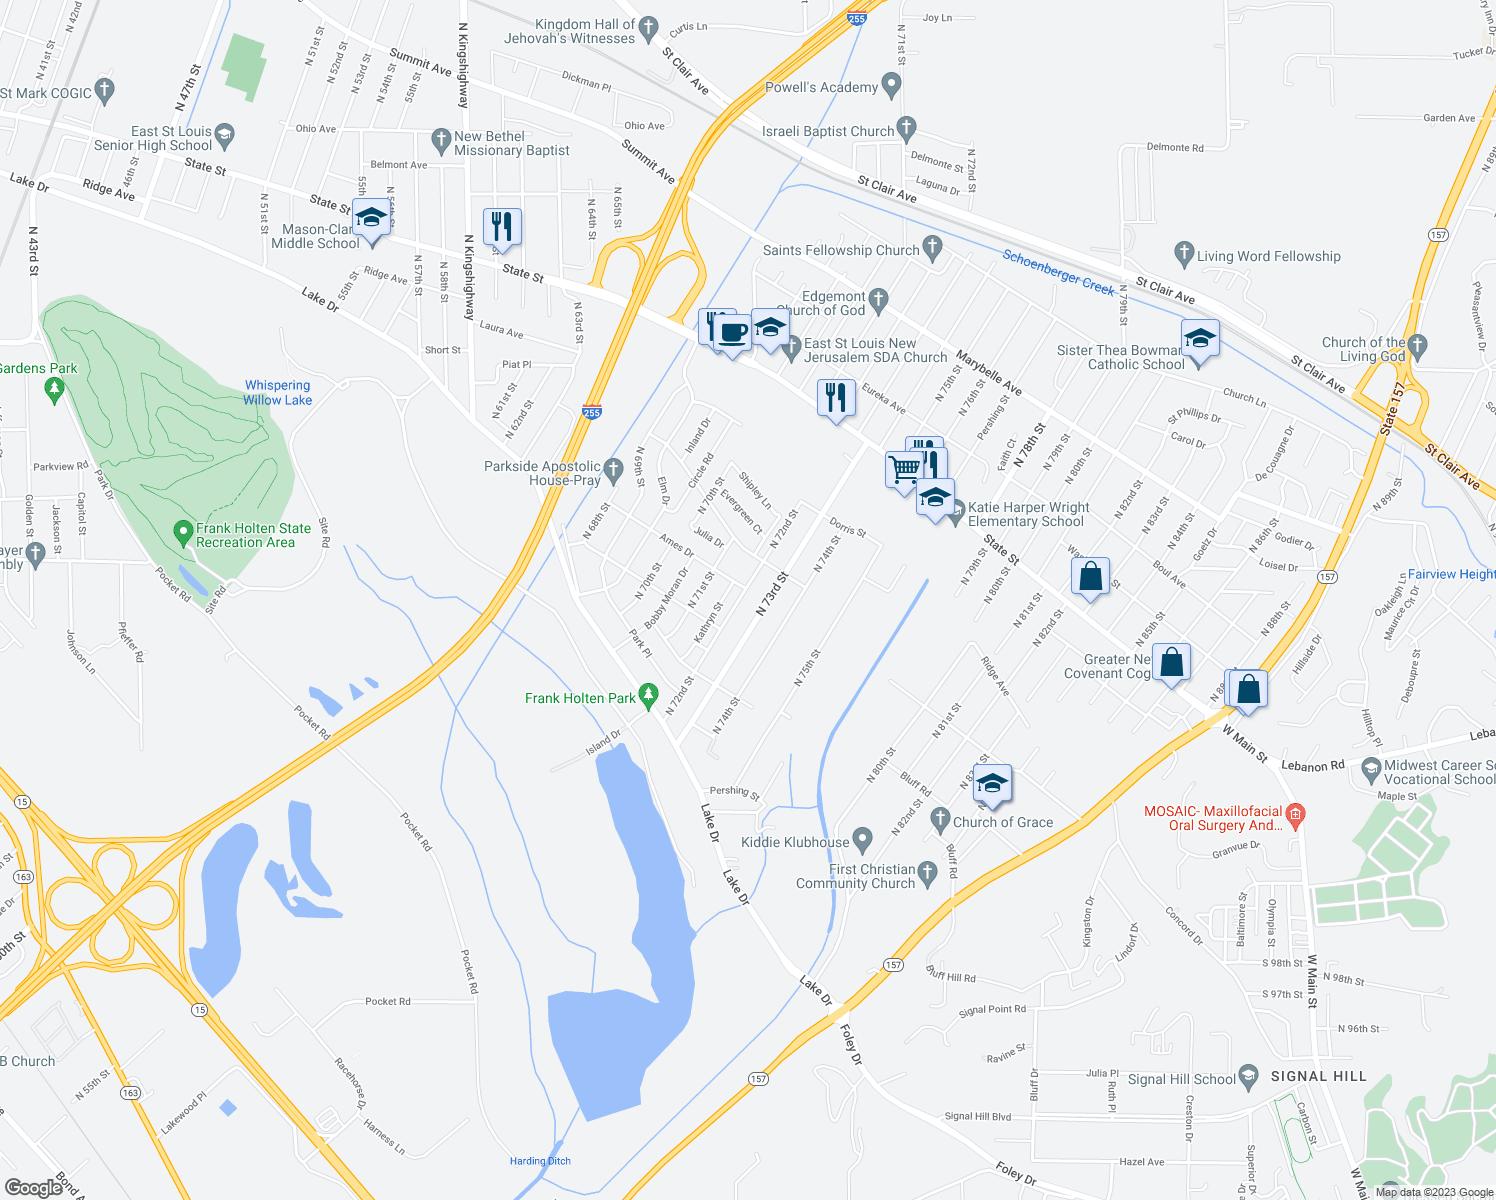 ann arbor google maps google maps ann arbor world of tanks maps. minneapolis food truck map minneapolis food truck map map of